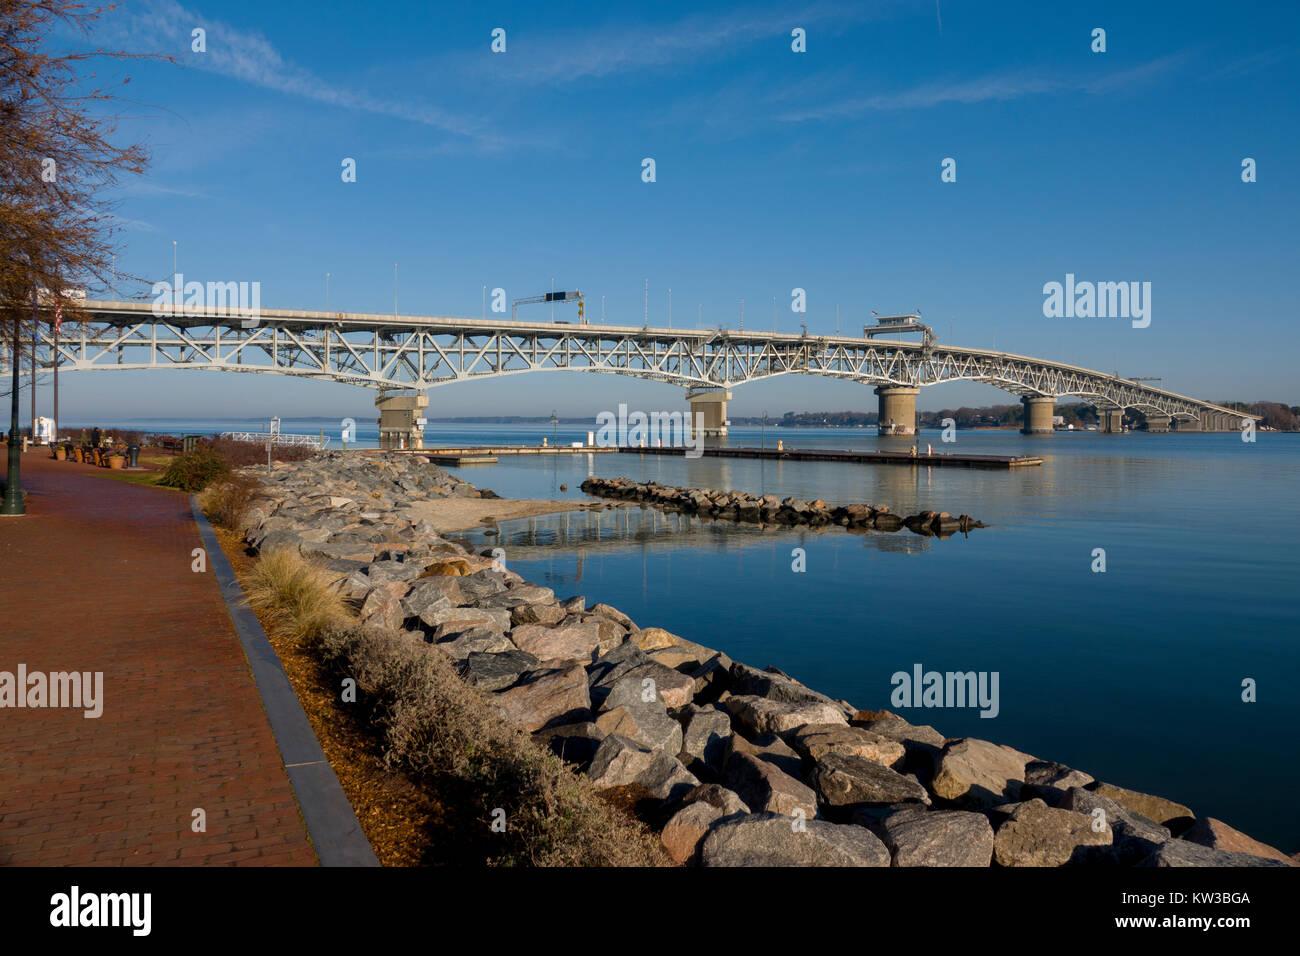 USA Virginia VA Yorktown York River the George P Coleman Memorial Bridge double swing bridge bascule type at Gloucester - Stock Image